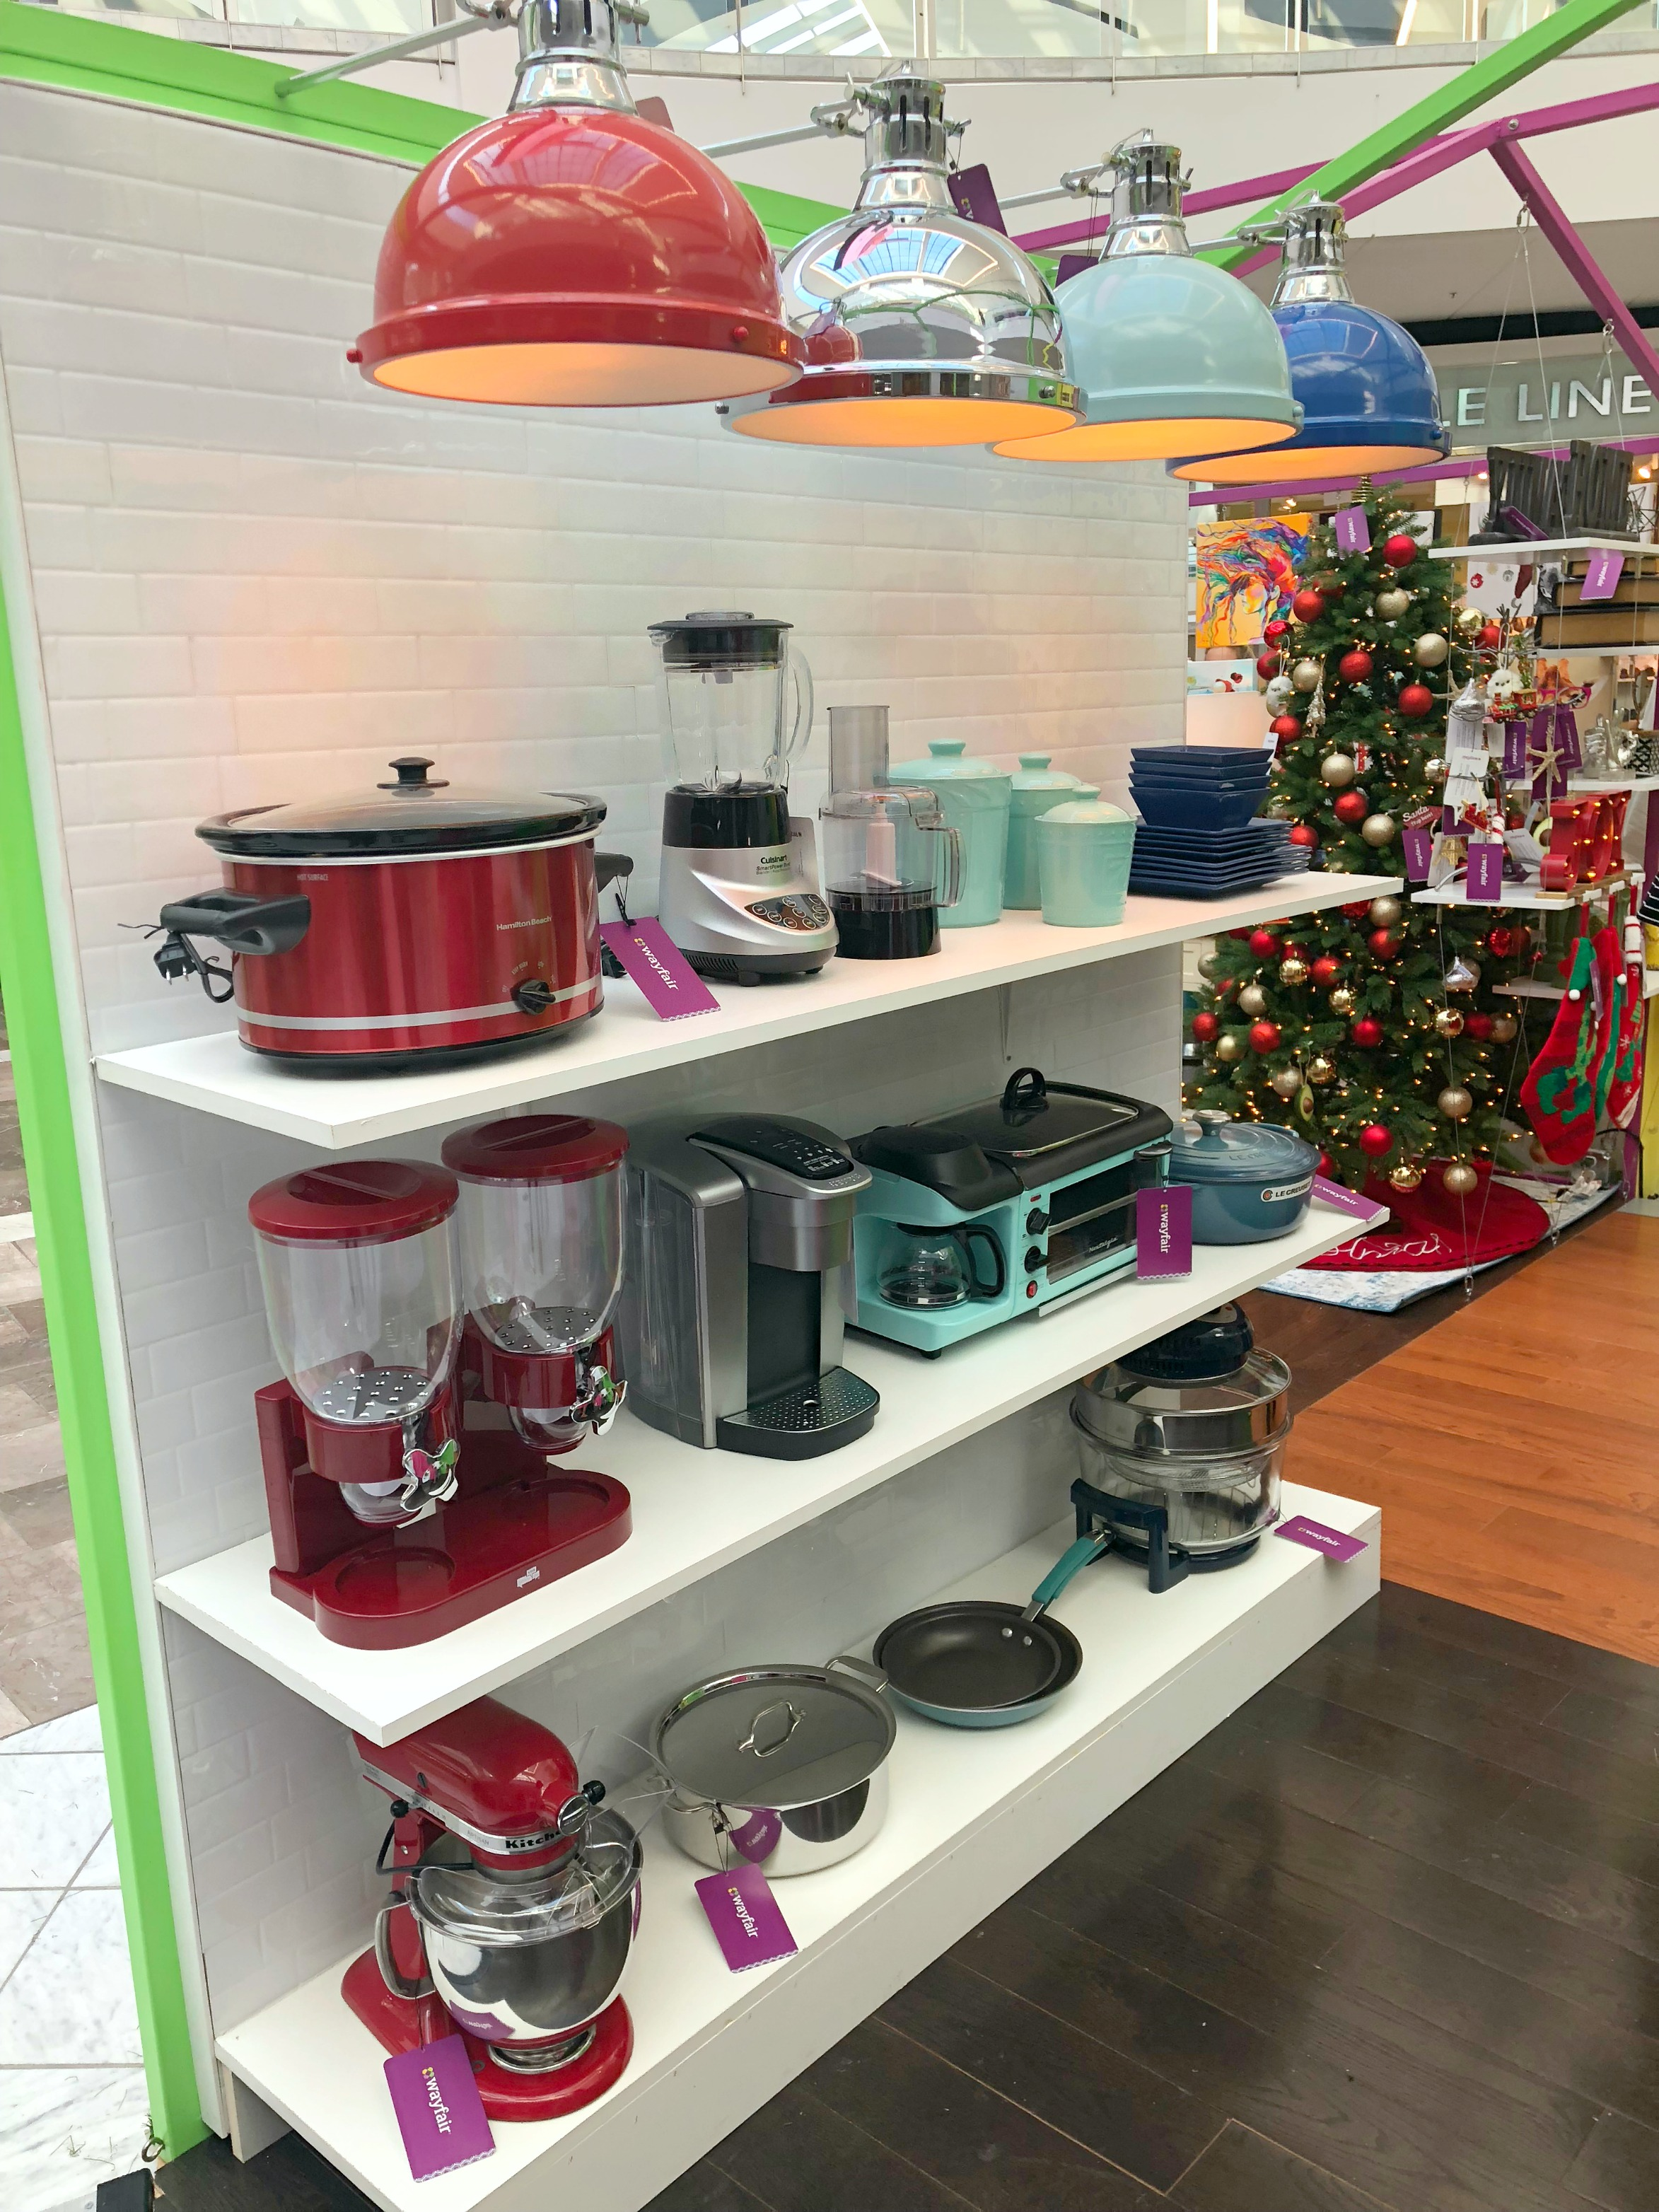 Wayfair Pop-Up Shop